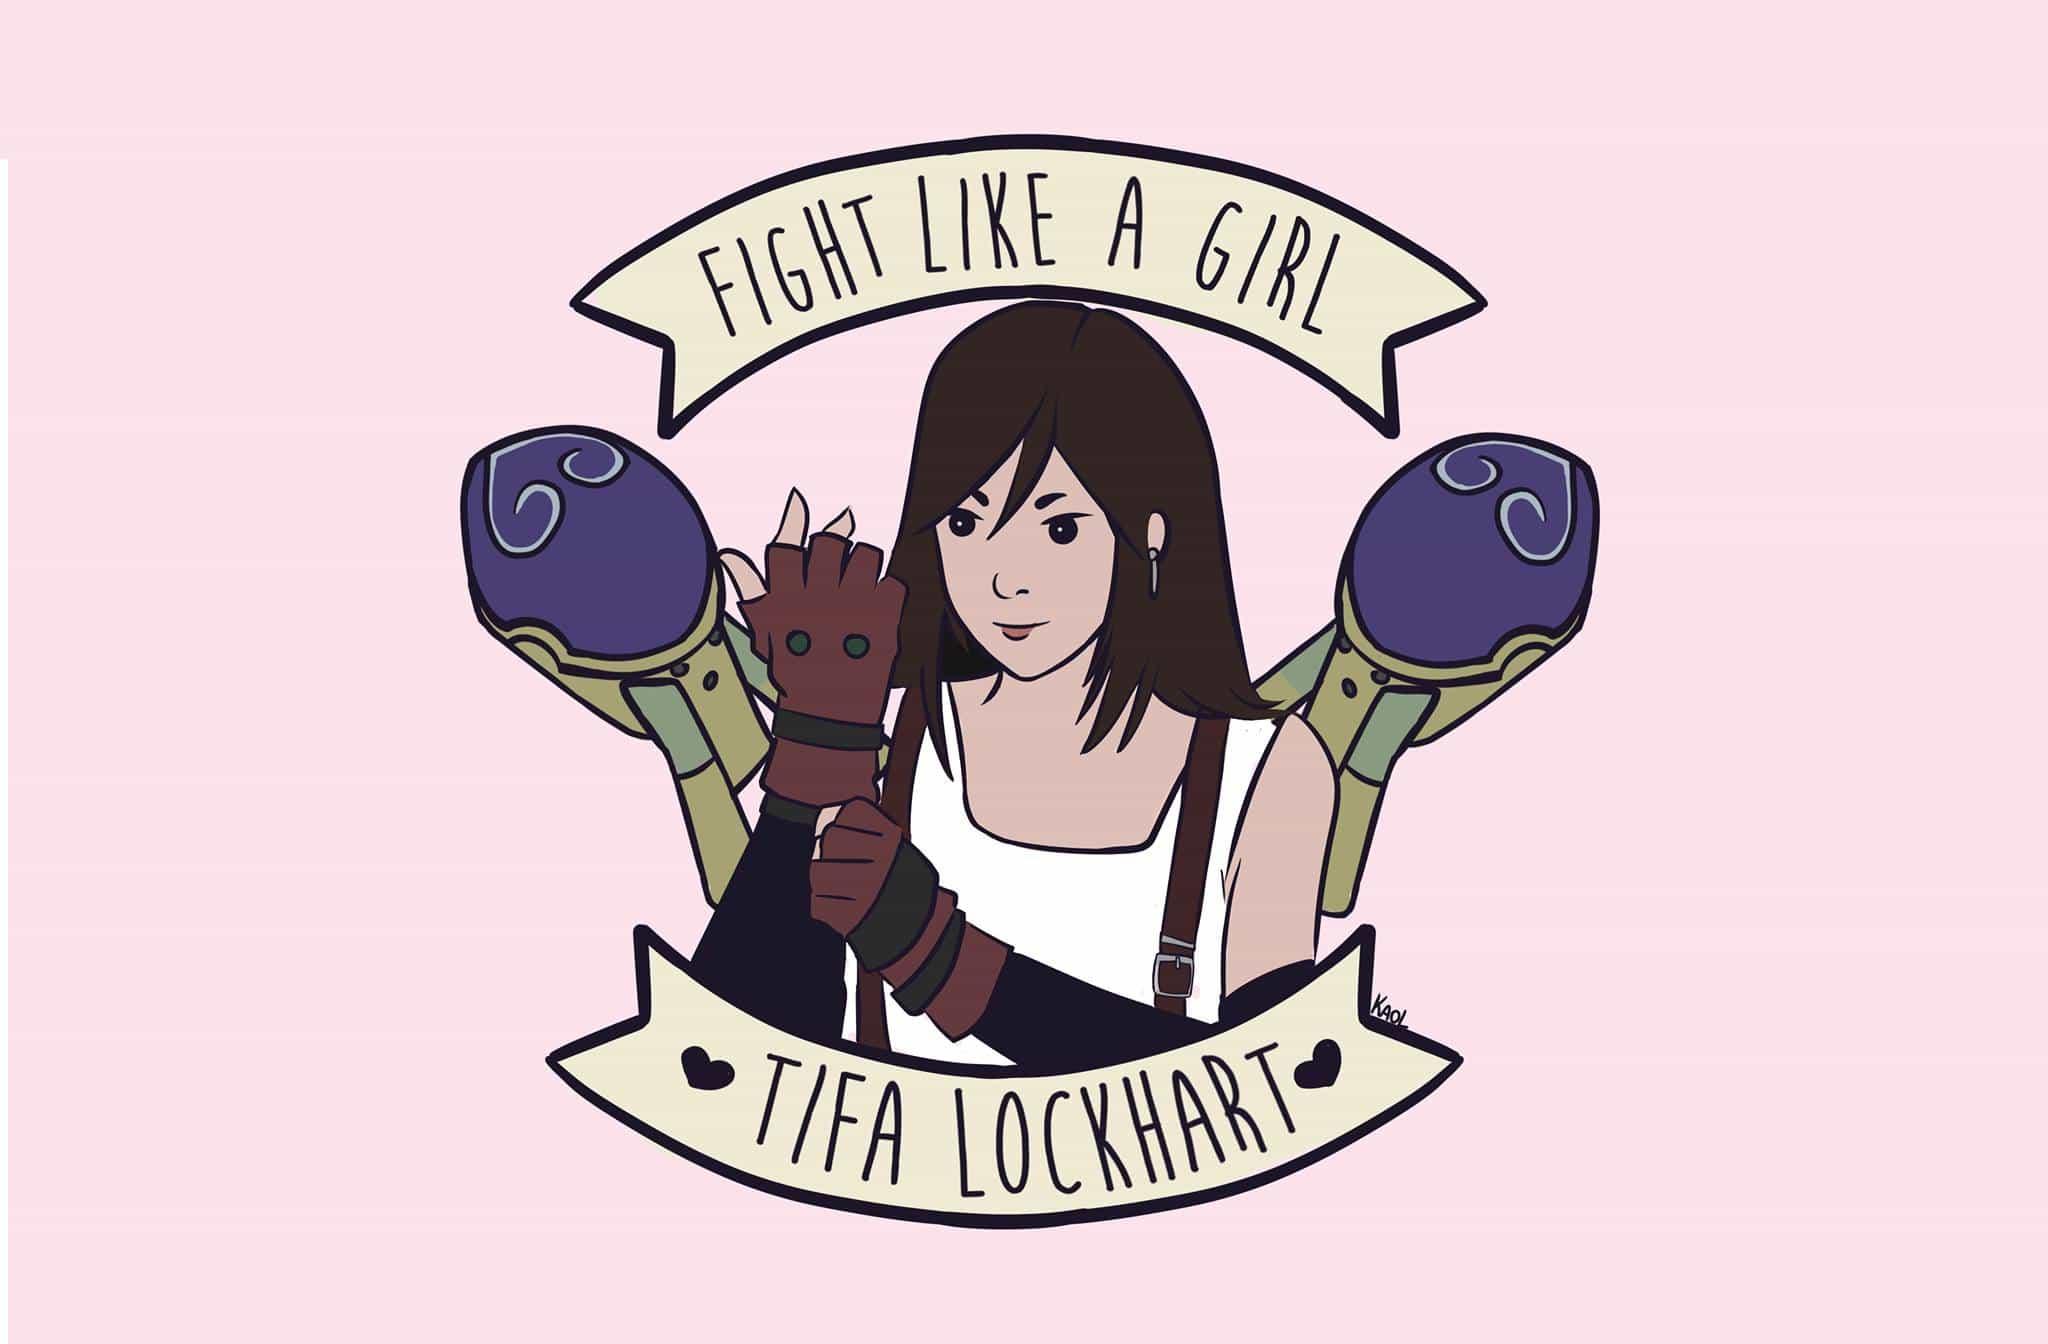 Fight Like A Girl Tifa, Hay una lesbiana en mi sopa